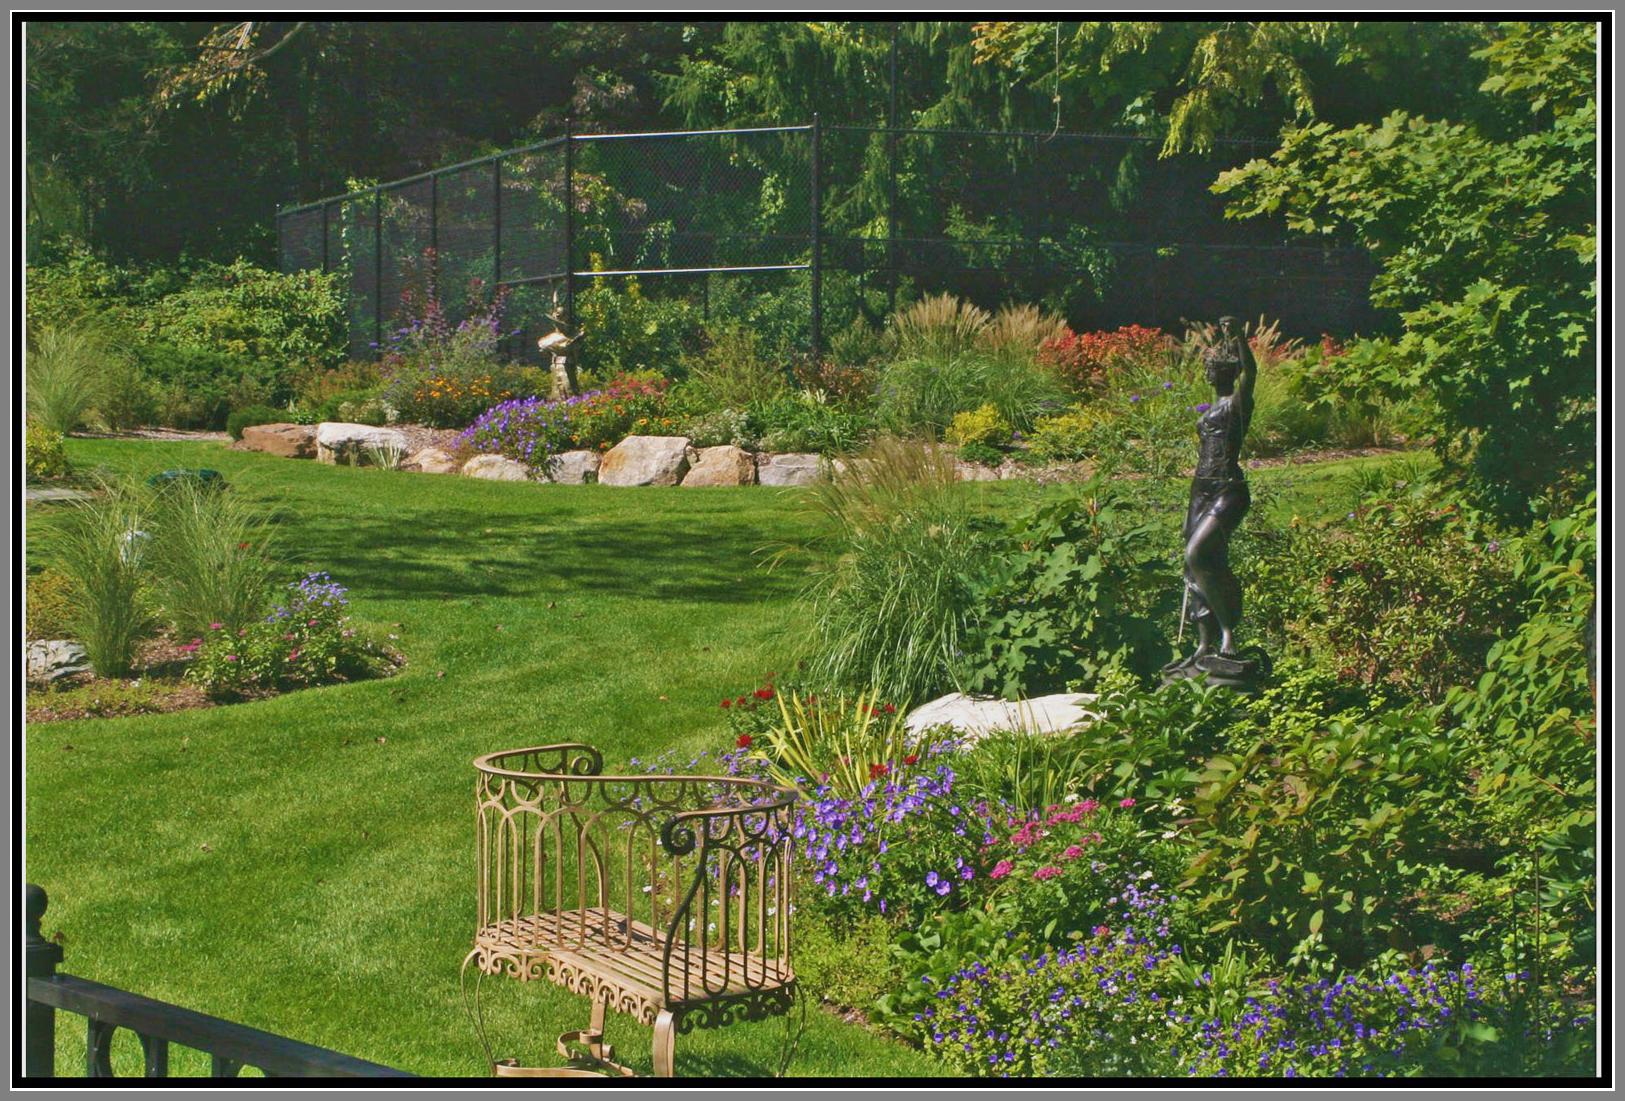 Garden for relaxation